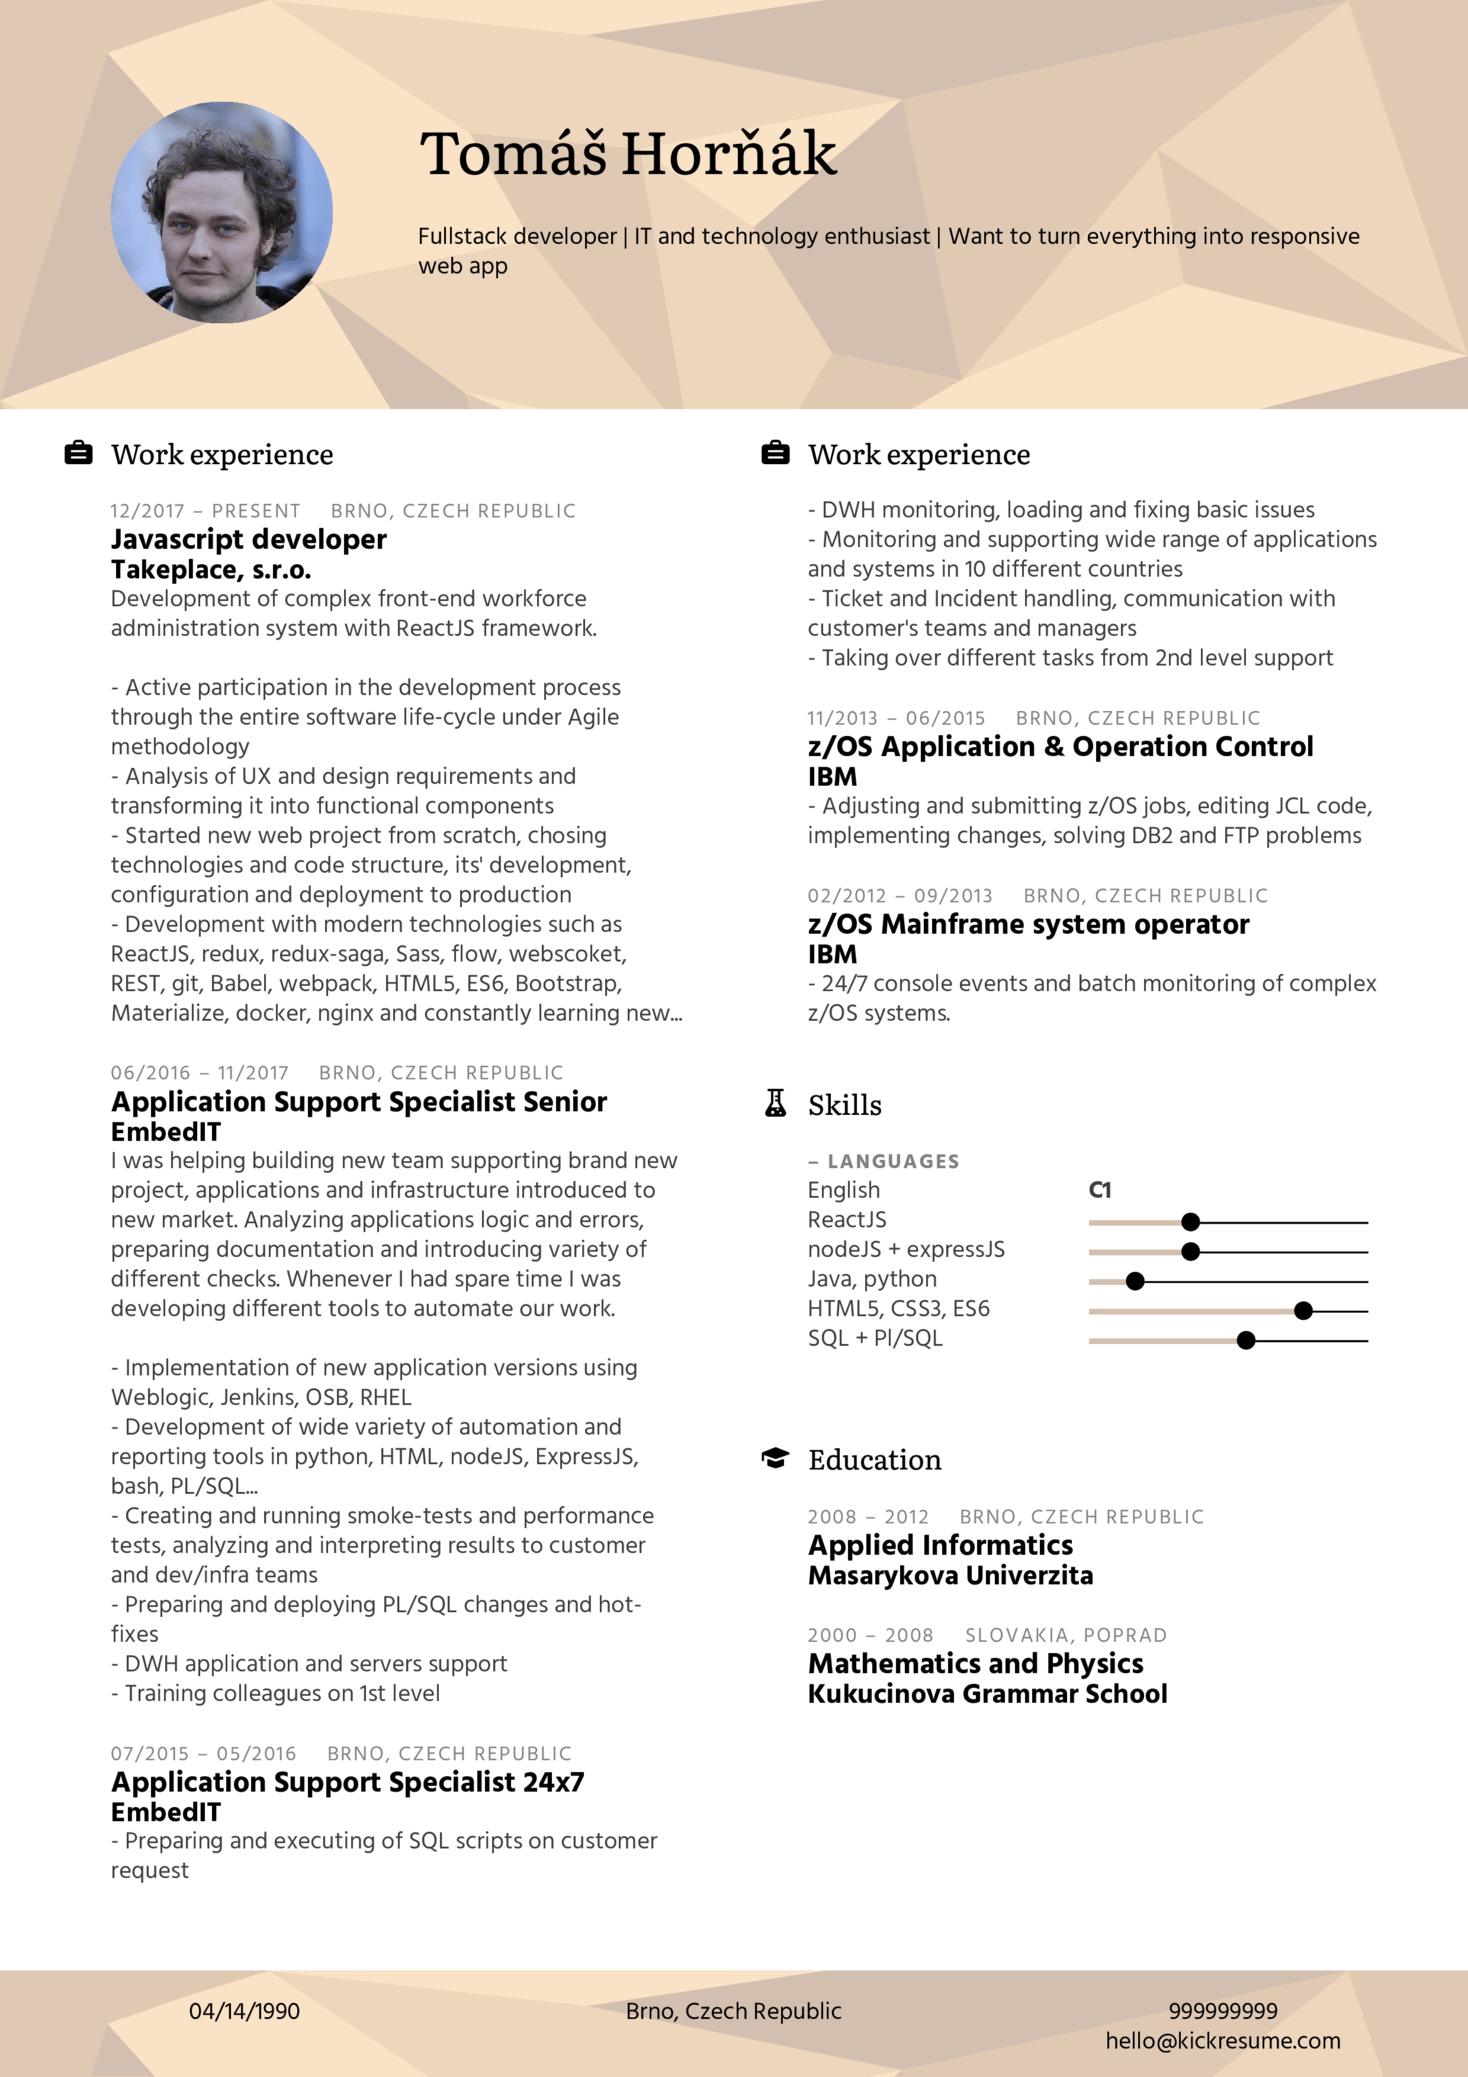 Takeplace Java Script Web Developer Resume Example (parte 1)